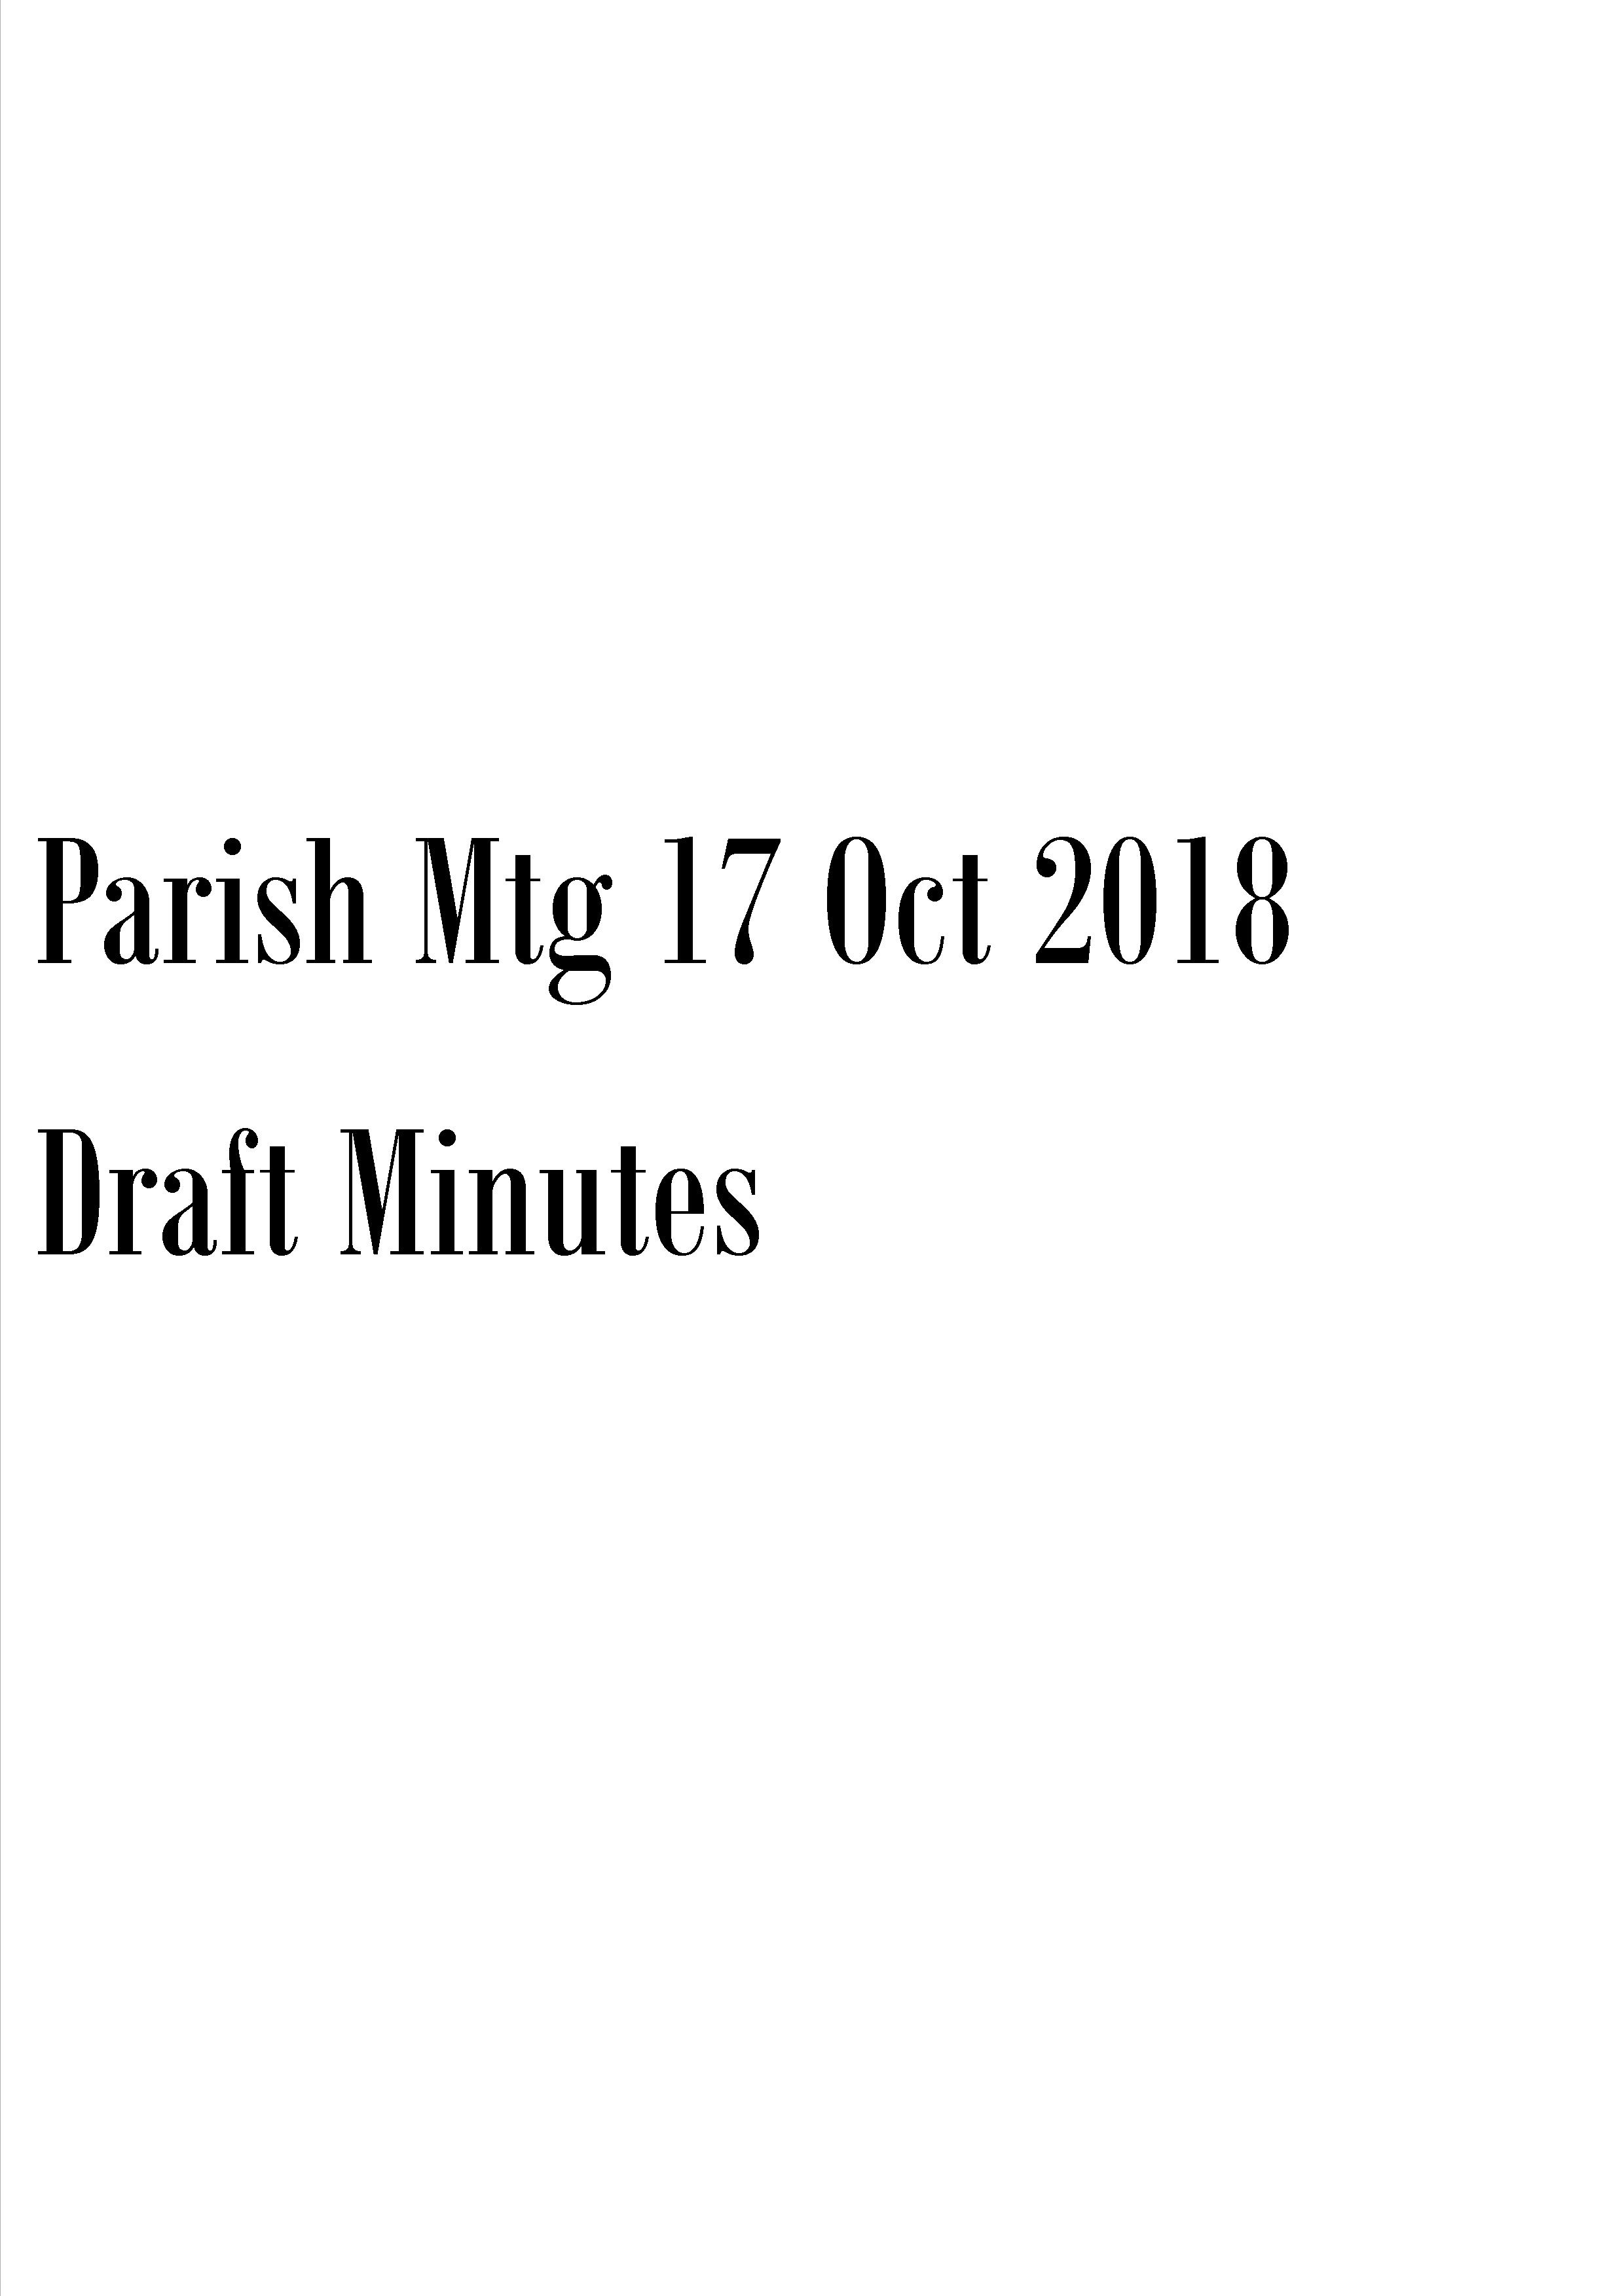 Draft minutes of meeting held on 17 October 2018